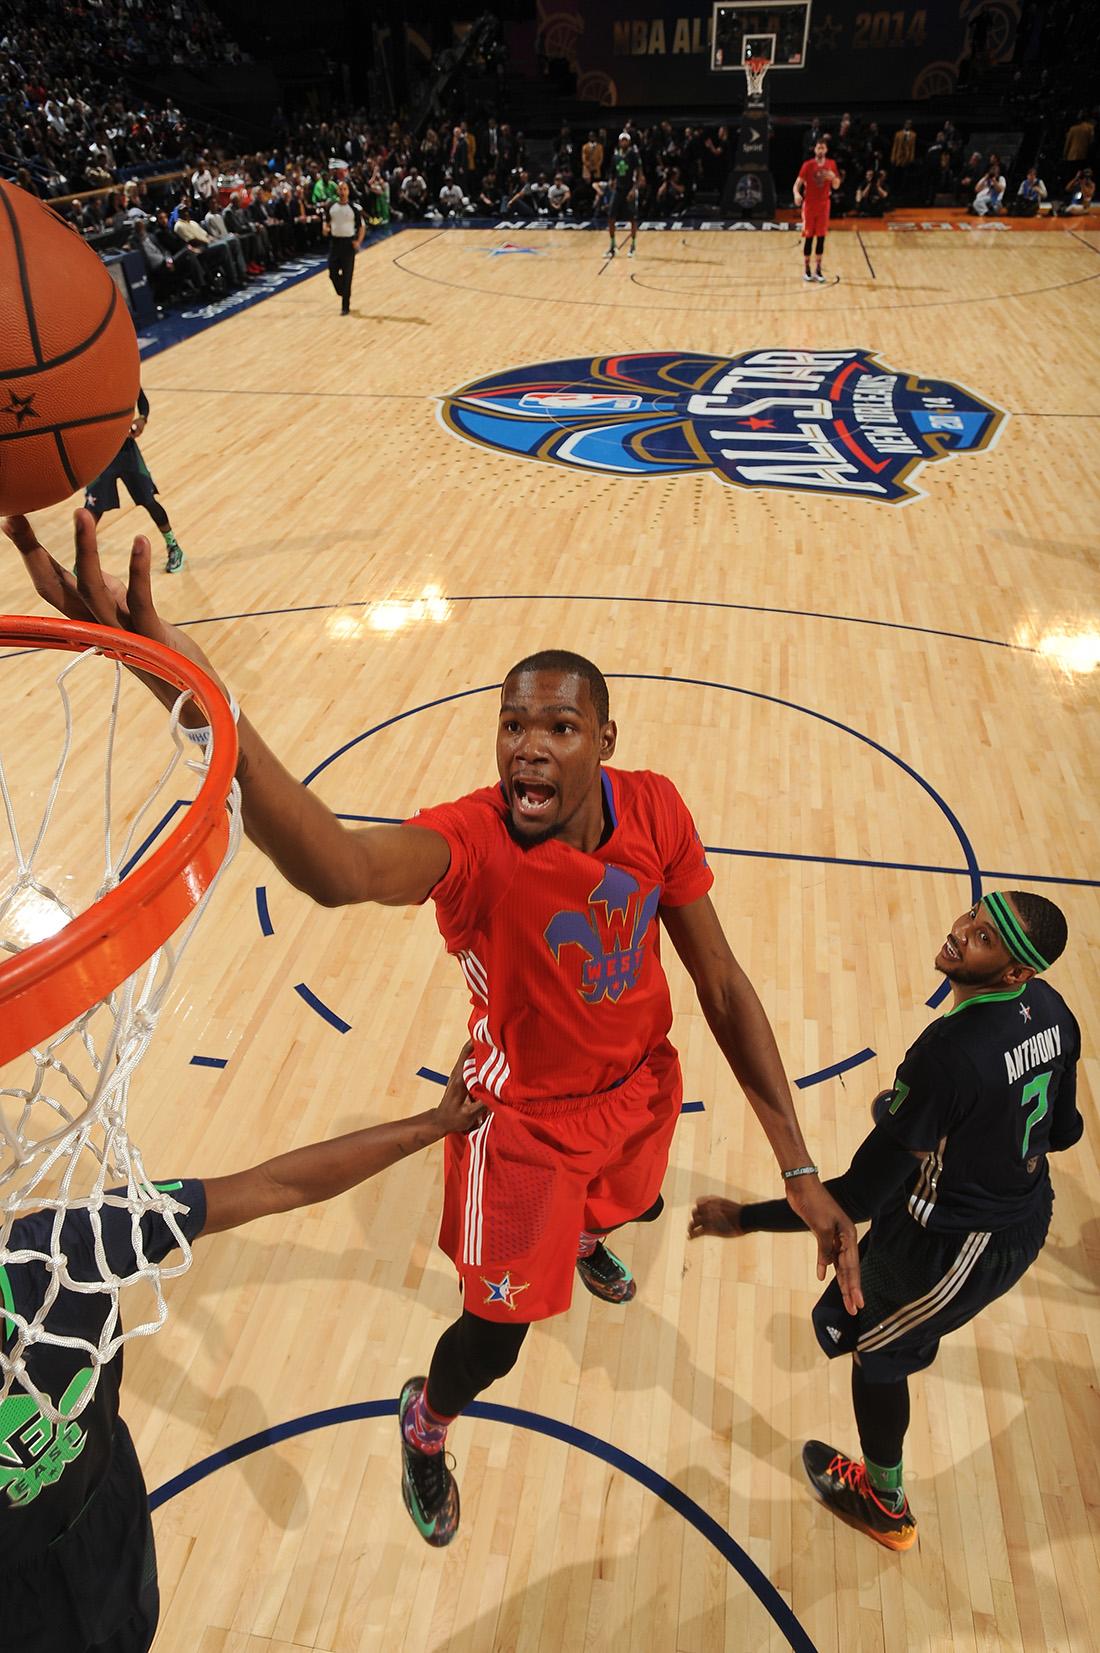 Kevin Durant NBA All-Star Game en viva basquet